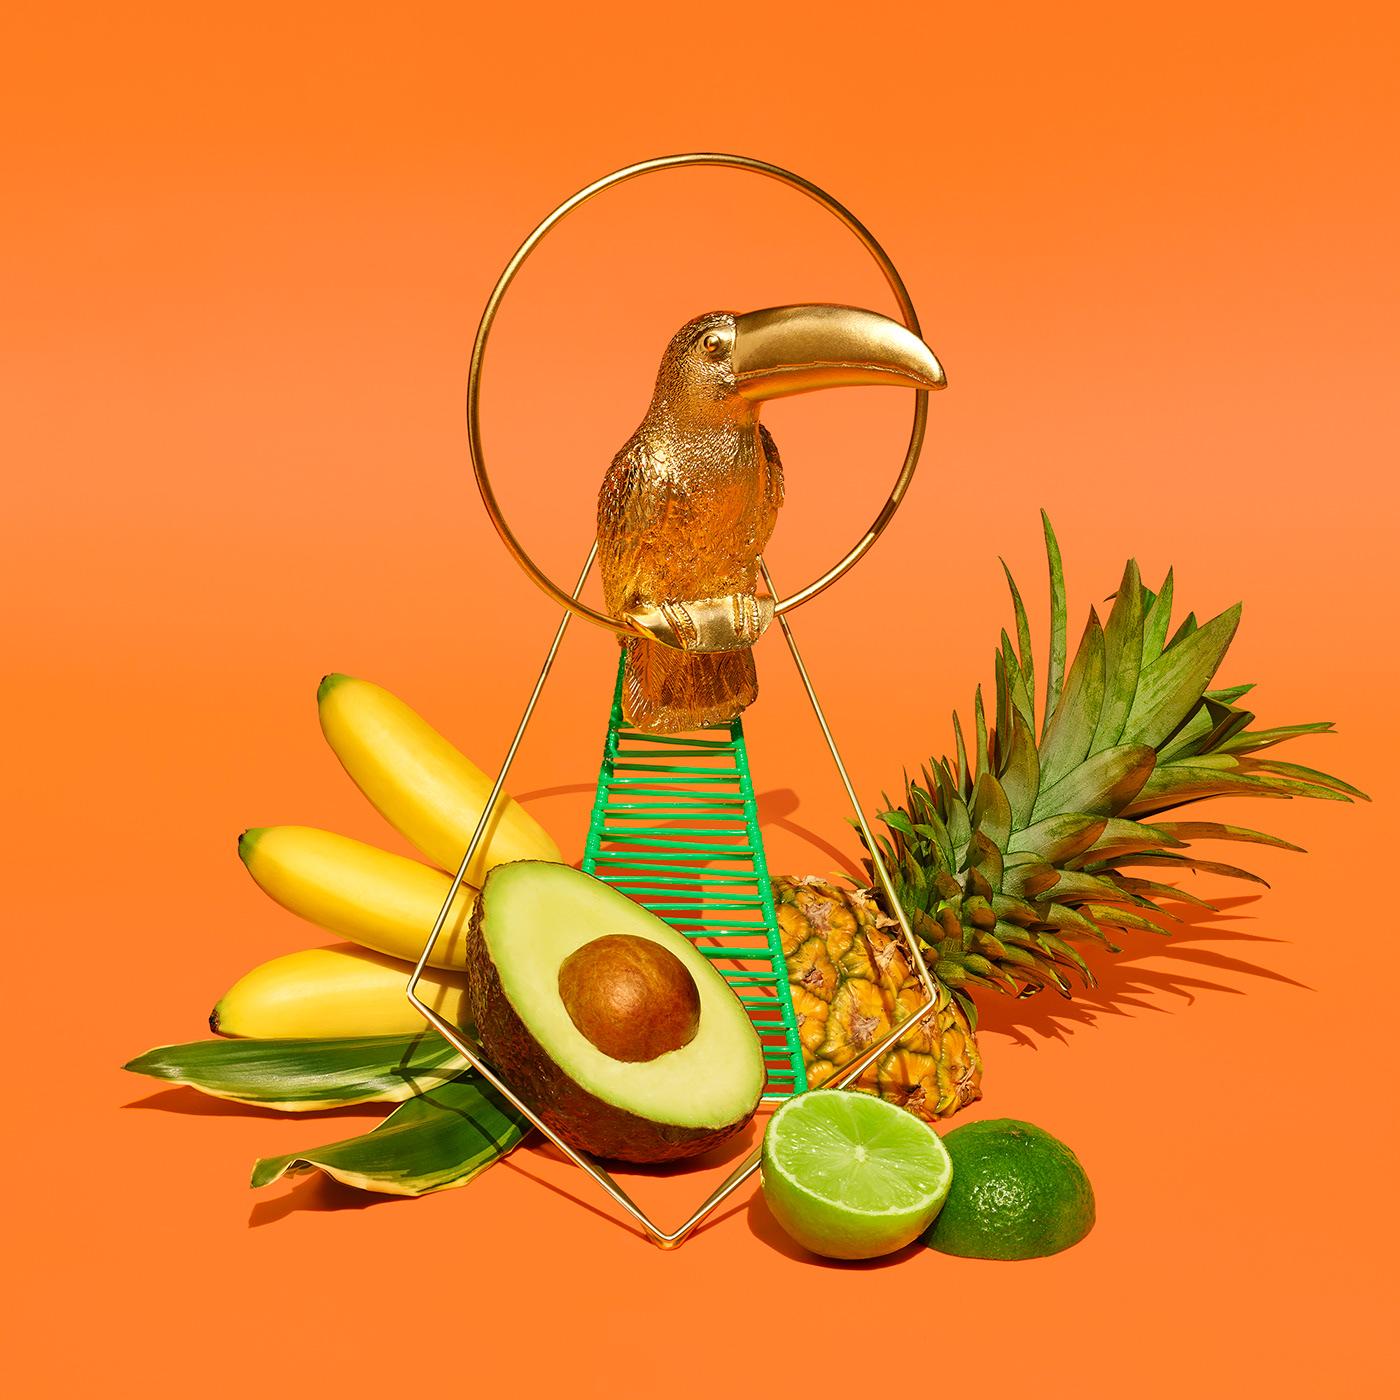 acapulco tropic set design  Swimmingpool beach 80s Fruit birds